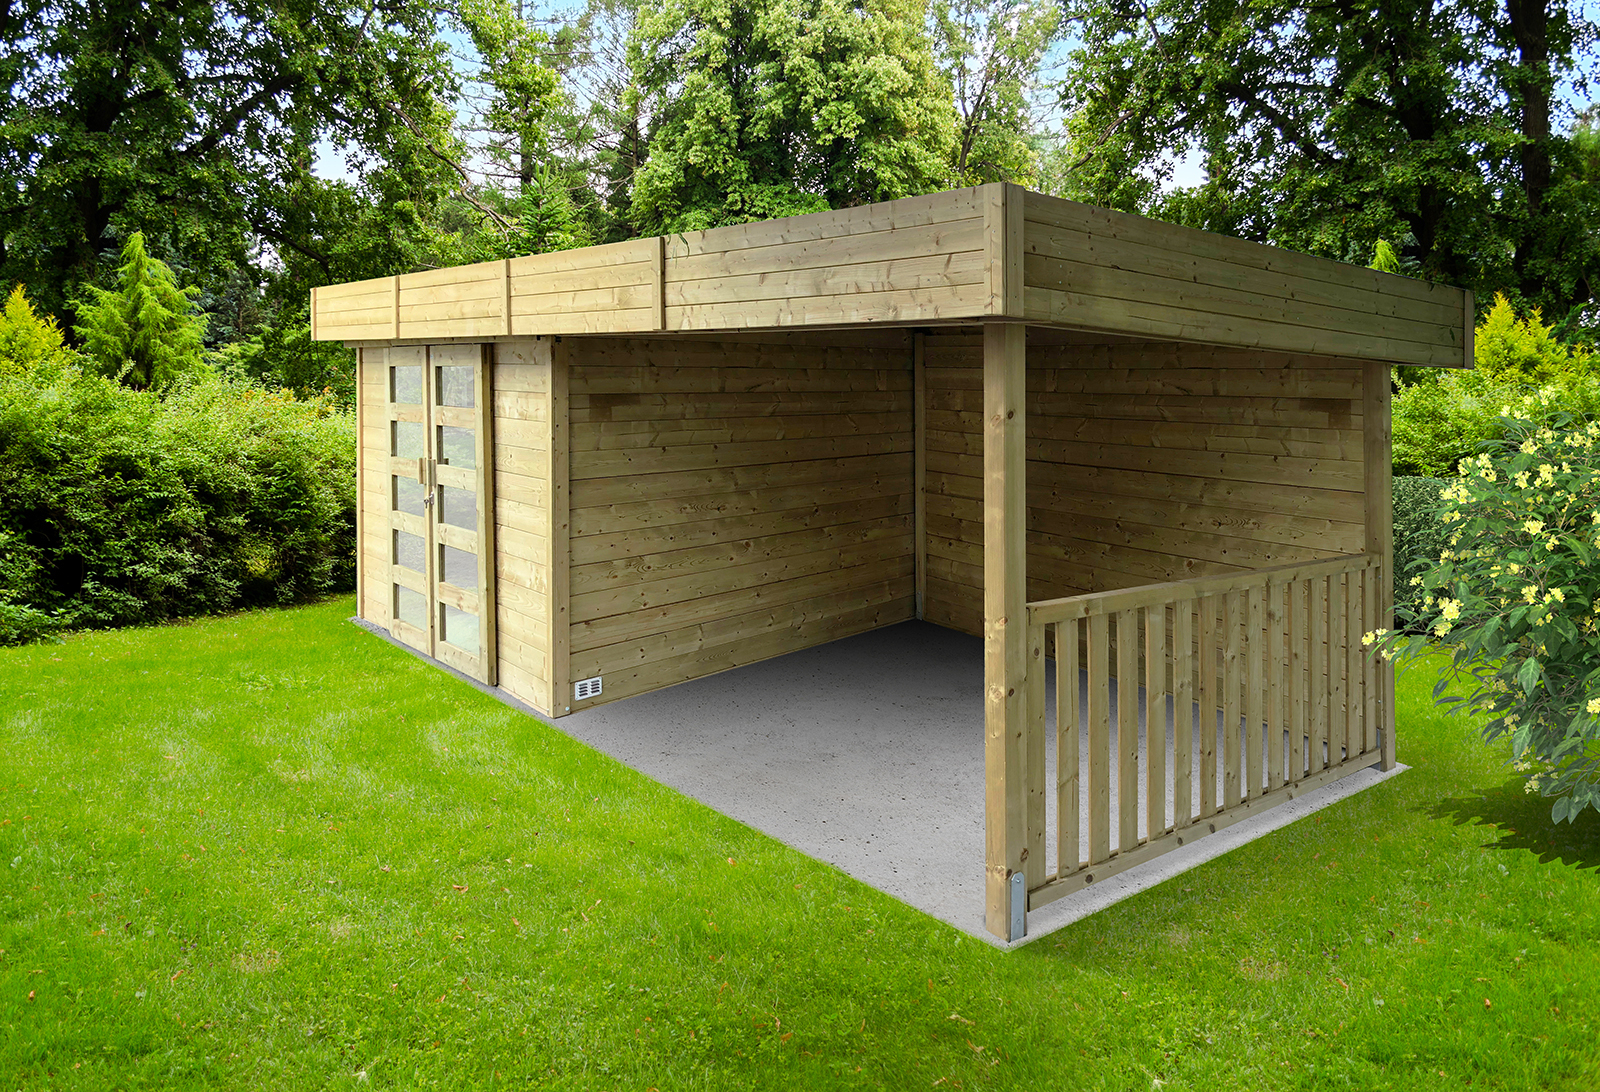 Abri De Jardin Moderne Arhus 28 Mm 3,3 + 3,17 X 2,45 M Solid - Mr.bricolage concernant Abri De Jardin Mr Bricolage